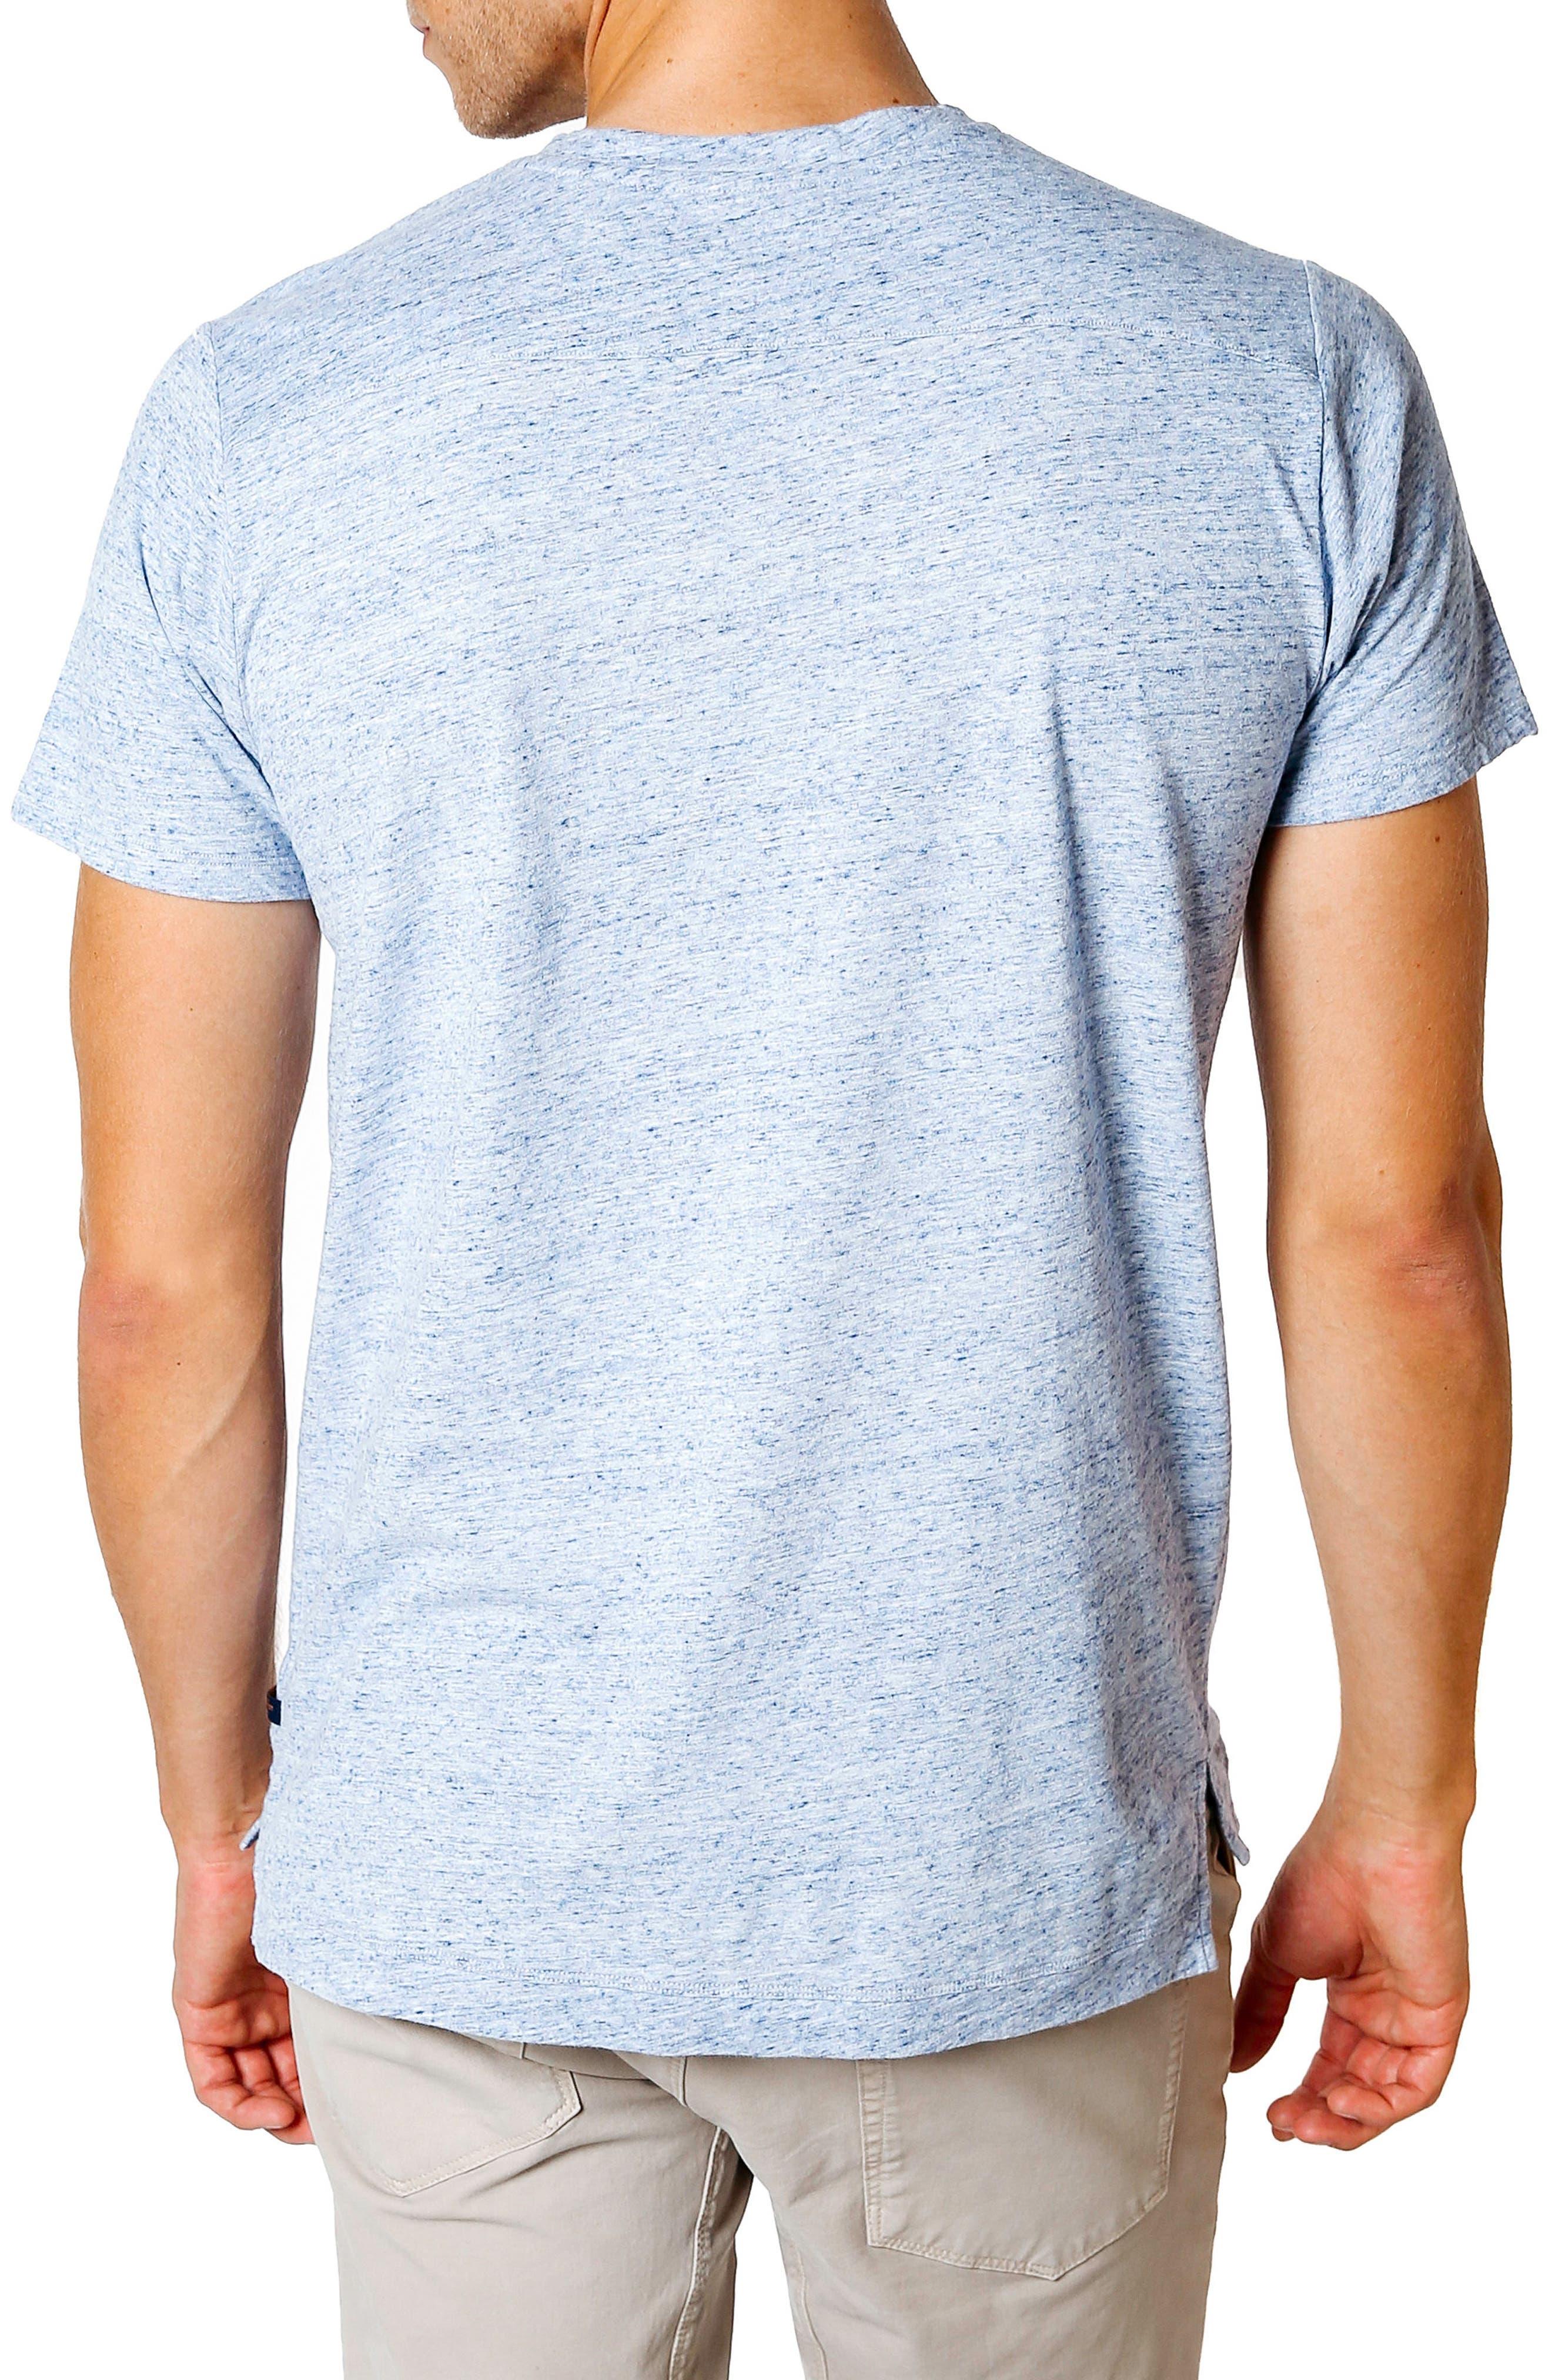 Slim Fit T-Shirt,                             Alternate thumbnail 2, color,                             BLUE HEATHER